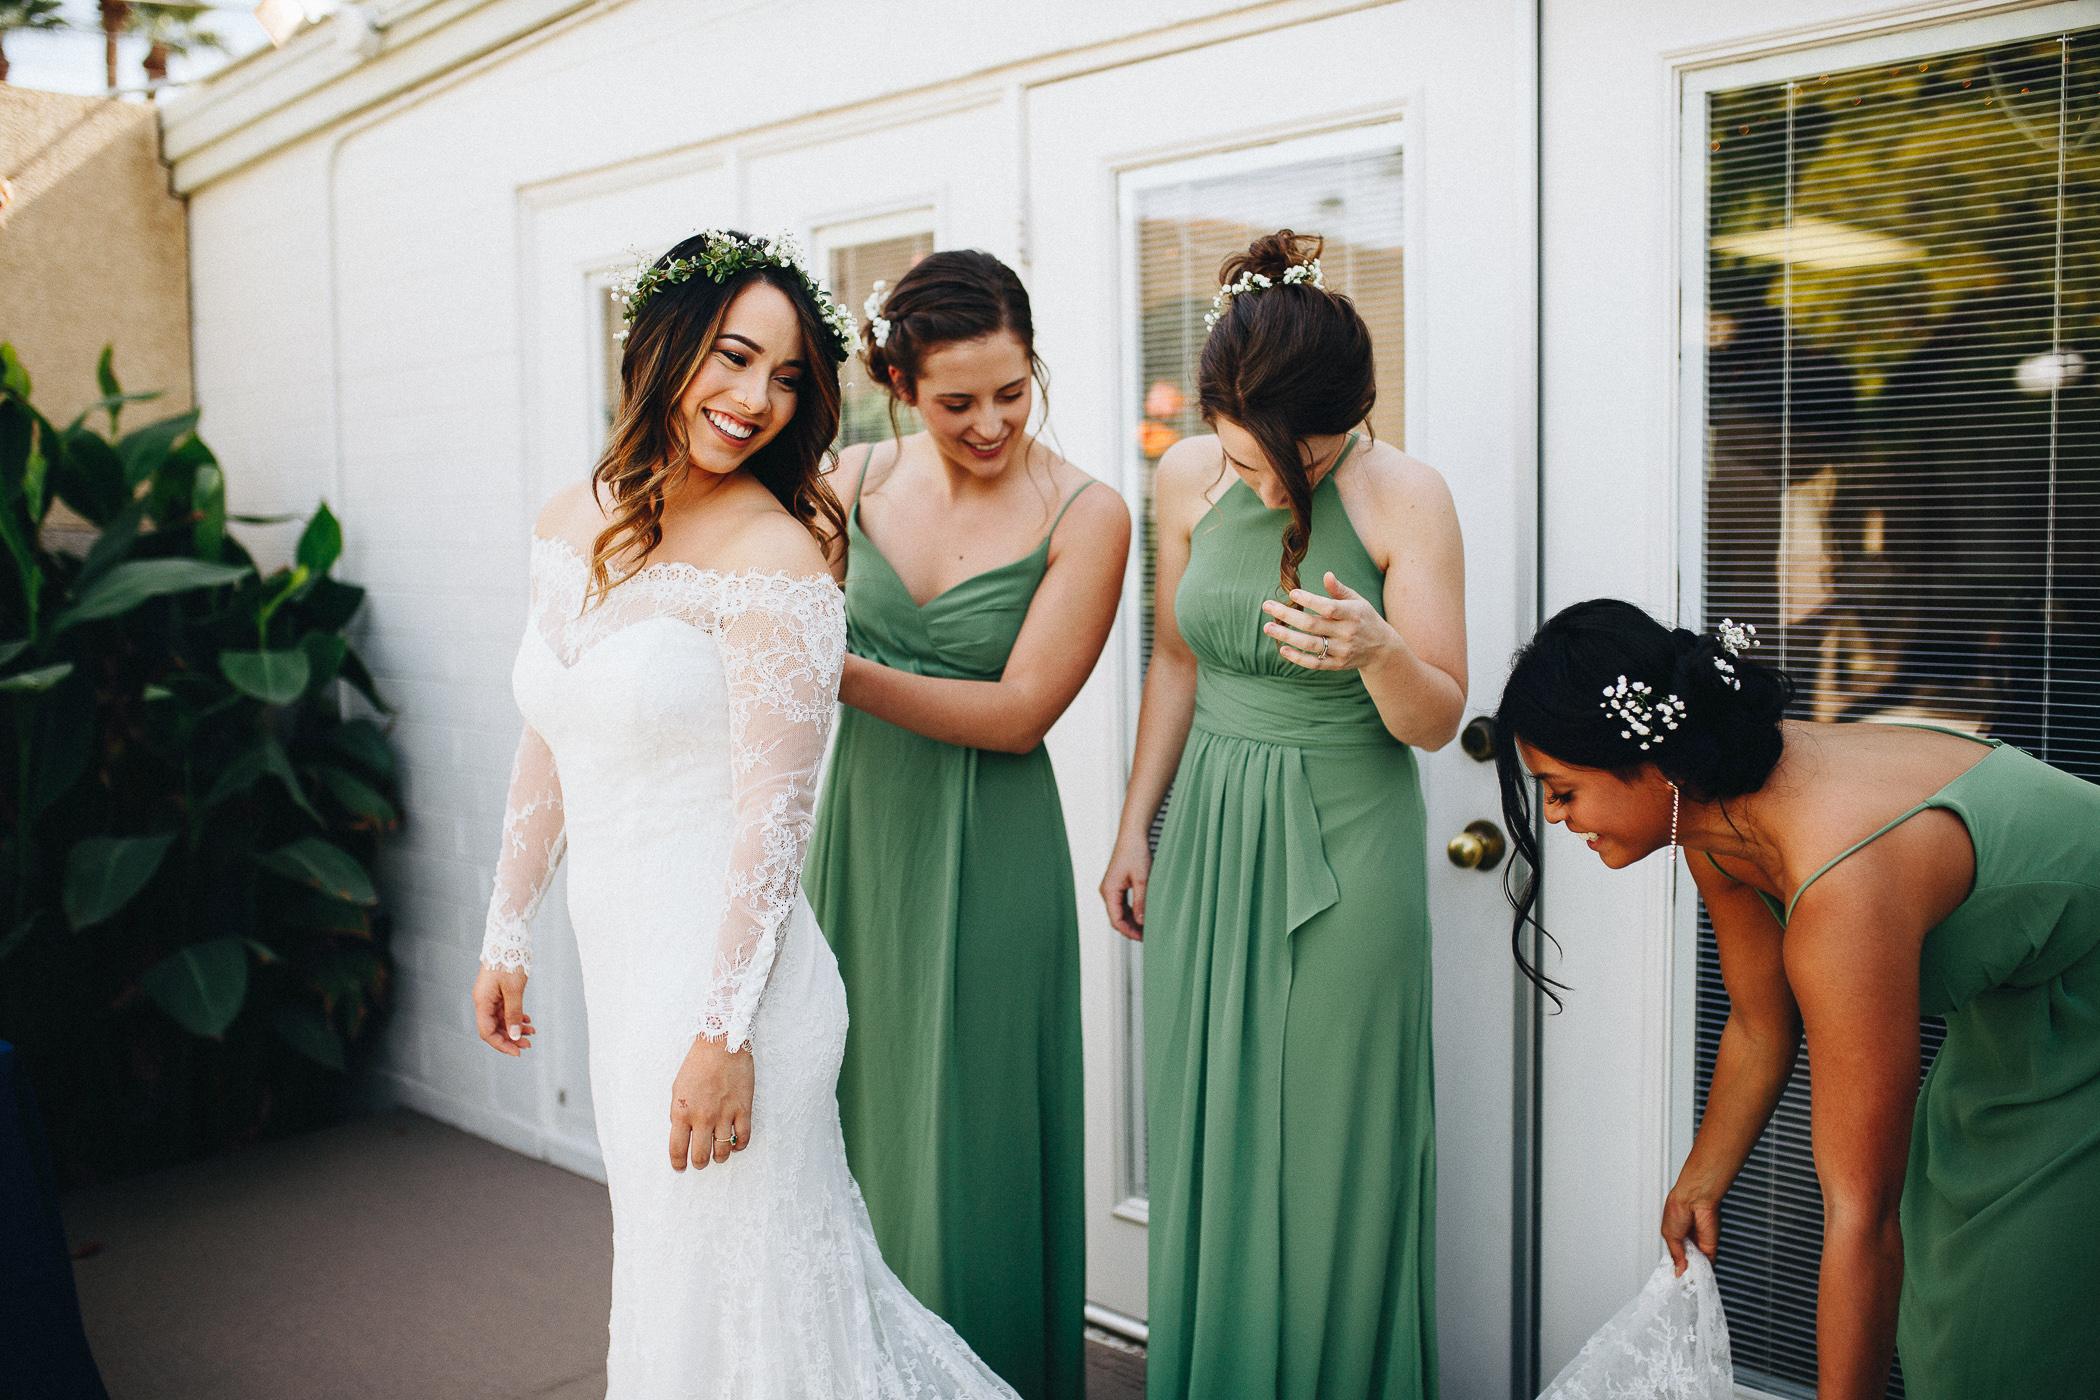 181104-Luxium-Weddings-Arizona-@matt__Le-Brandon-Kariana-Phoenix-Valley-Garden-Center-1008.jpg